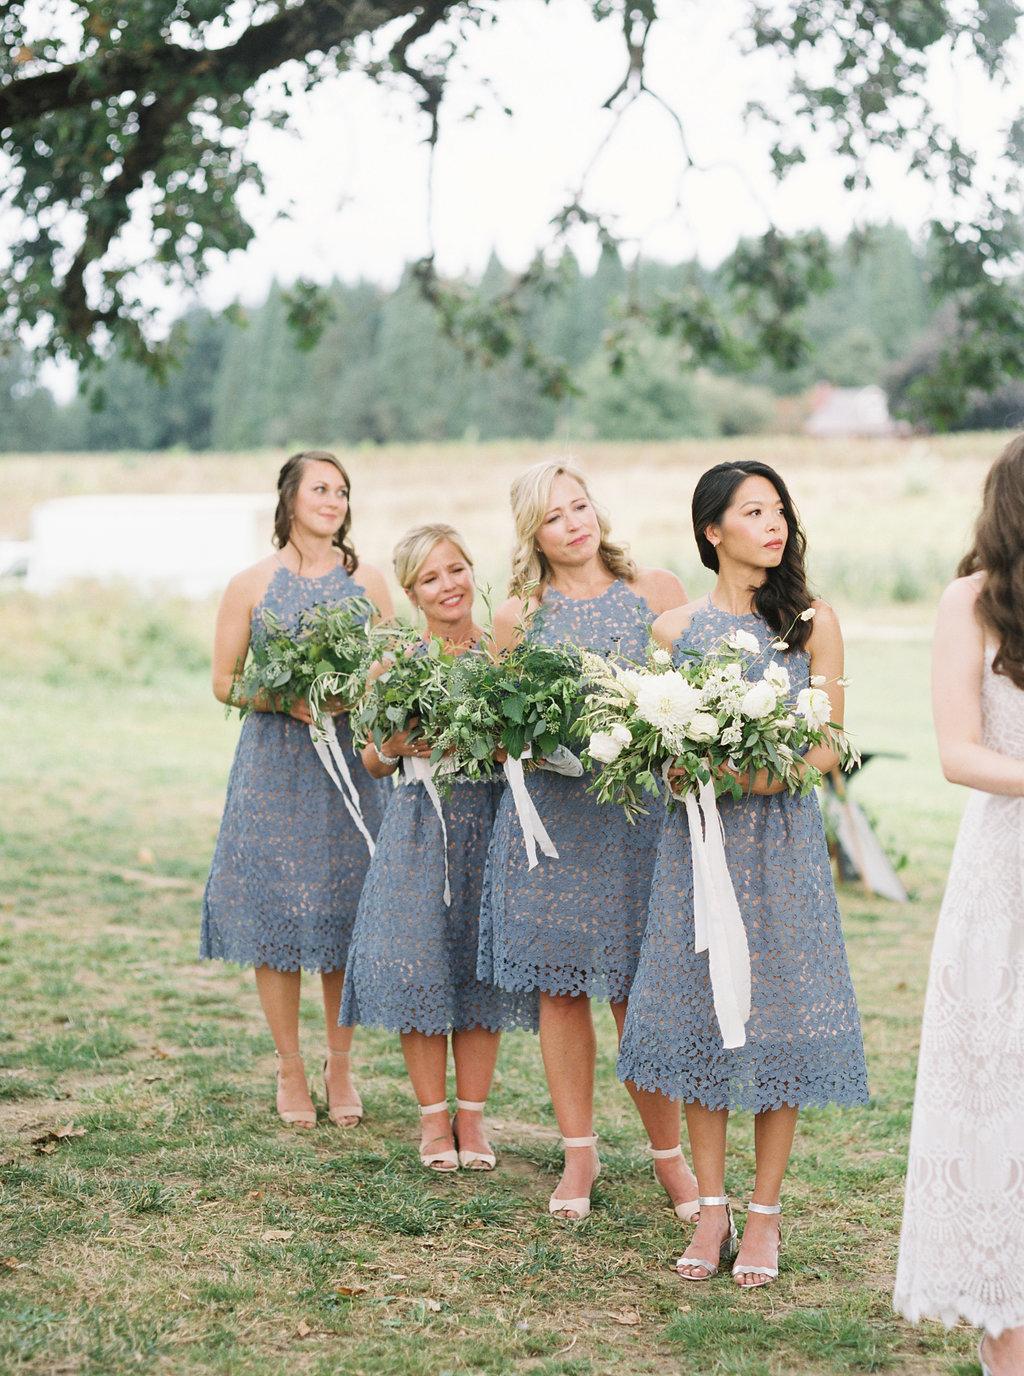 Jenna-Powers-chelsea&brandonwedding-568.jpg